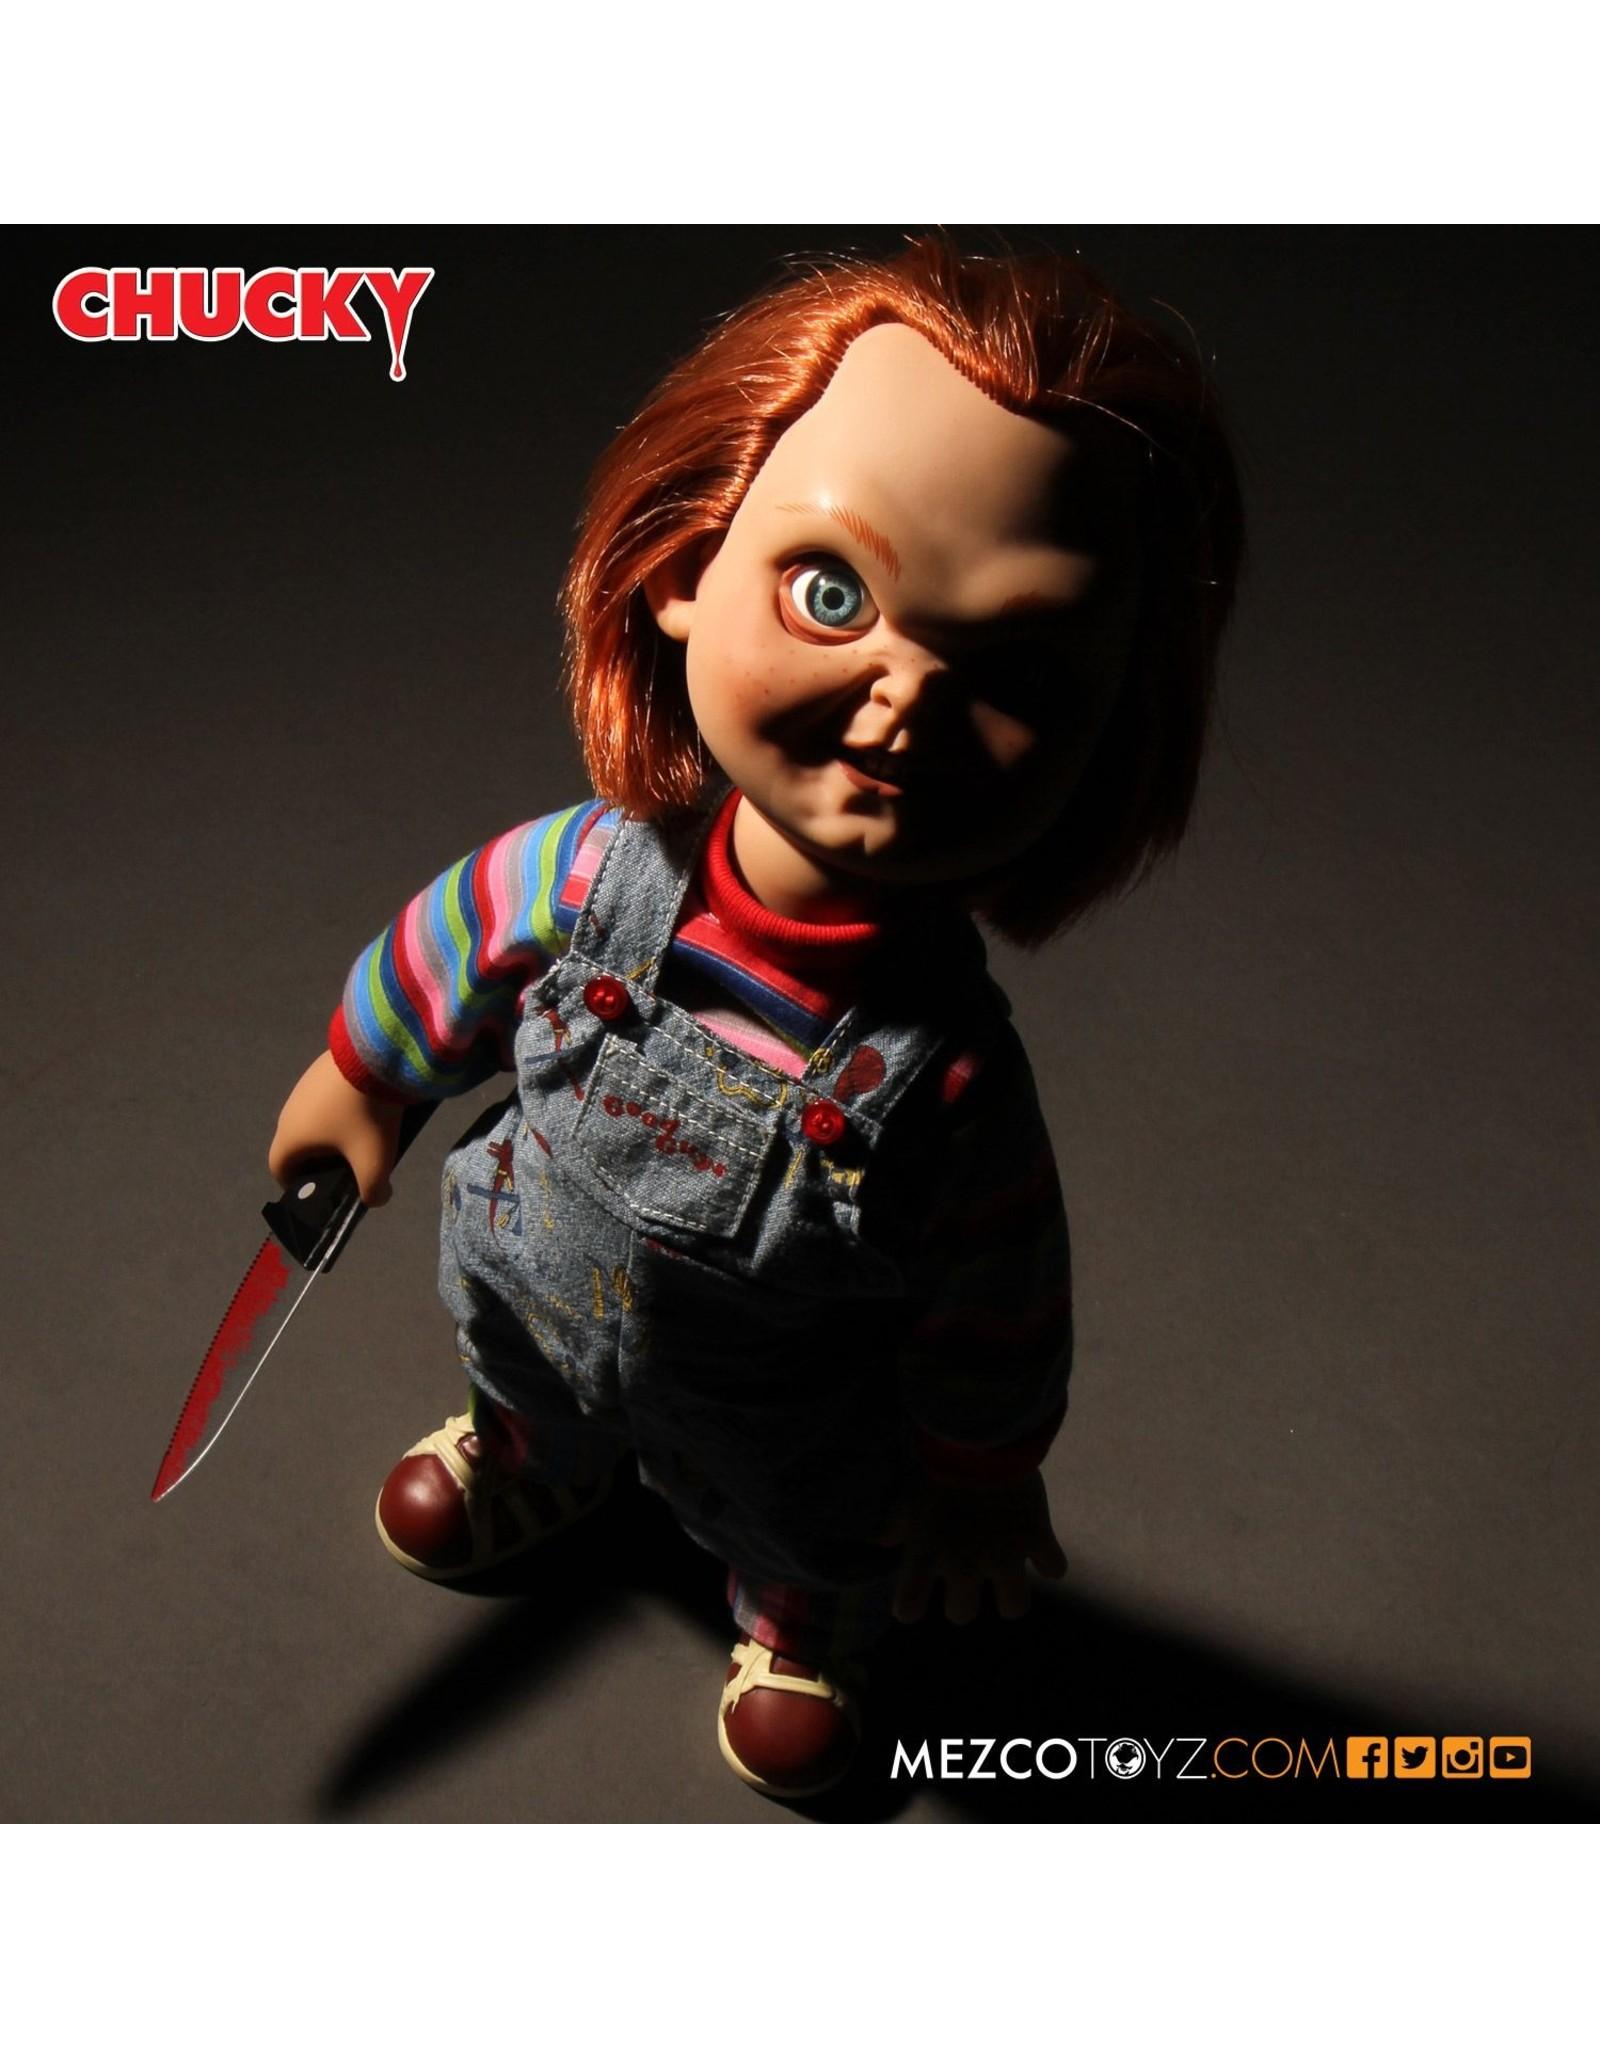 Mezco Talking Sneering Chucky Doll